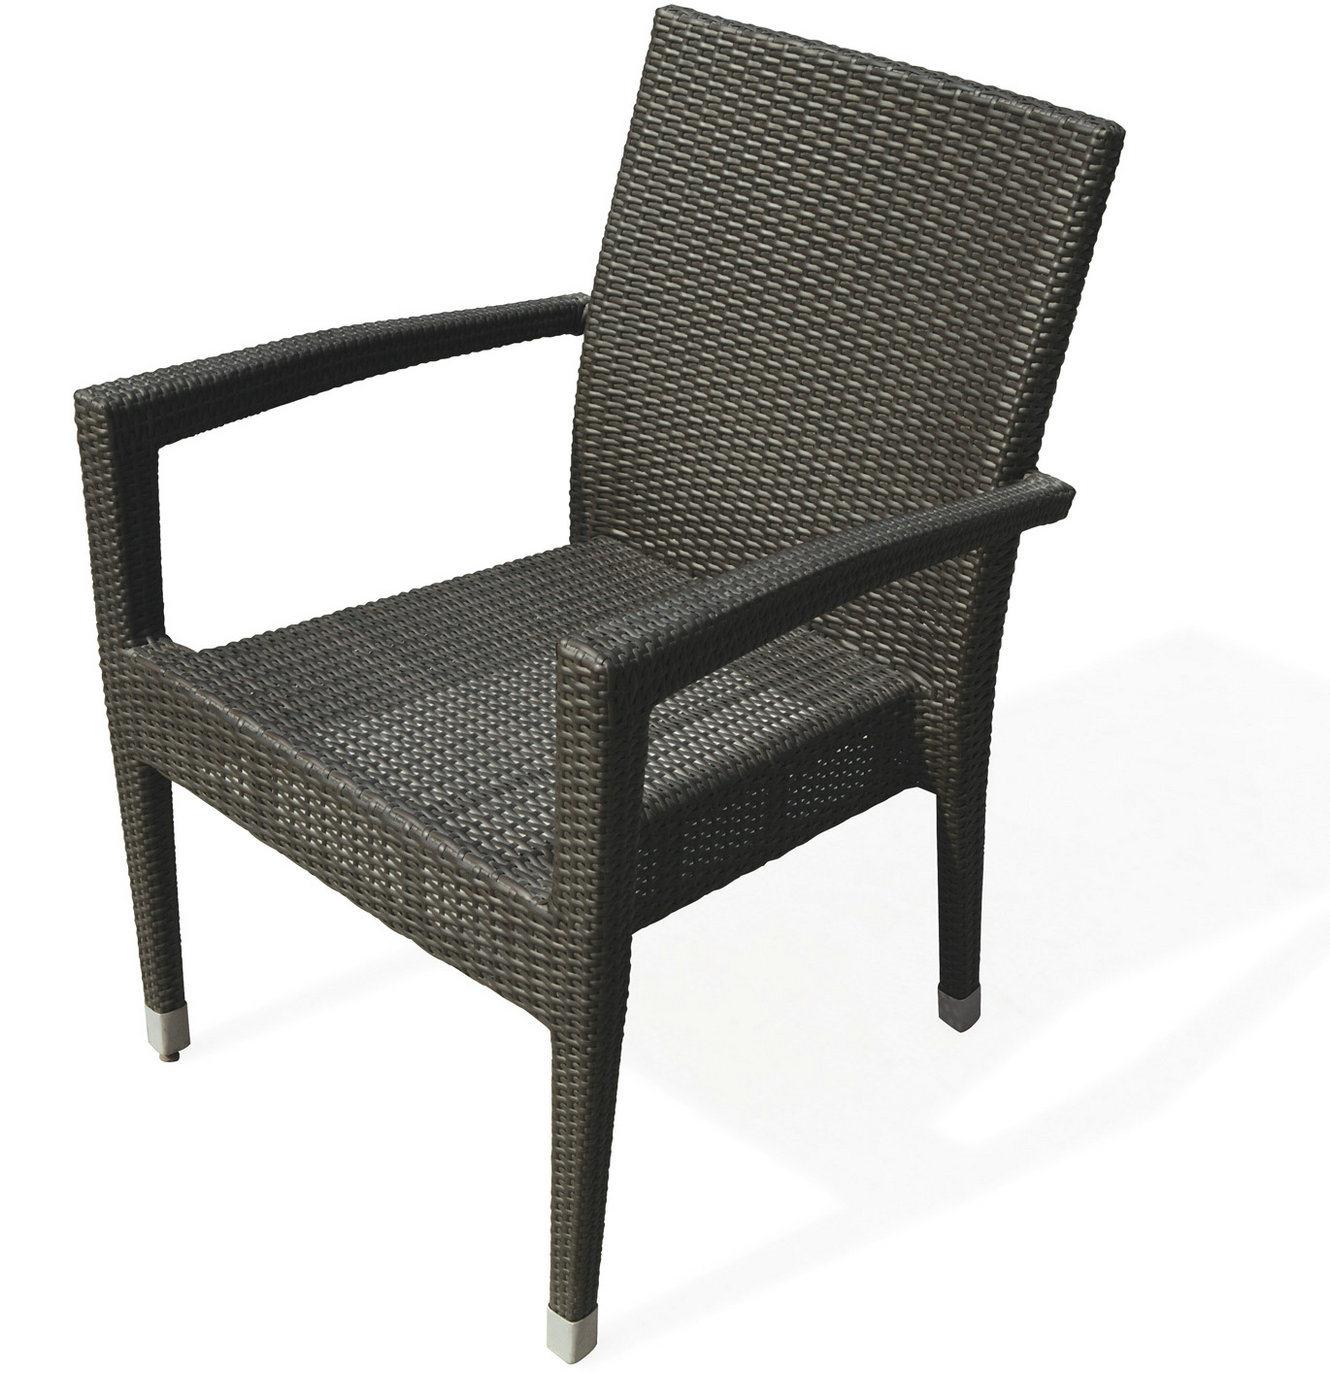 Rattan Single Sofa Rattan Deep Chair Garden Chair  sc 1 st  Foshan Lefo Furniture Co. Ltd. & China Rattan Single Sofa Rattan Deep Chair Garden Chair Photos ...